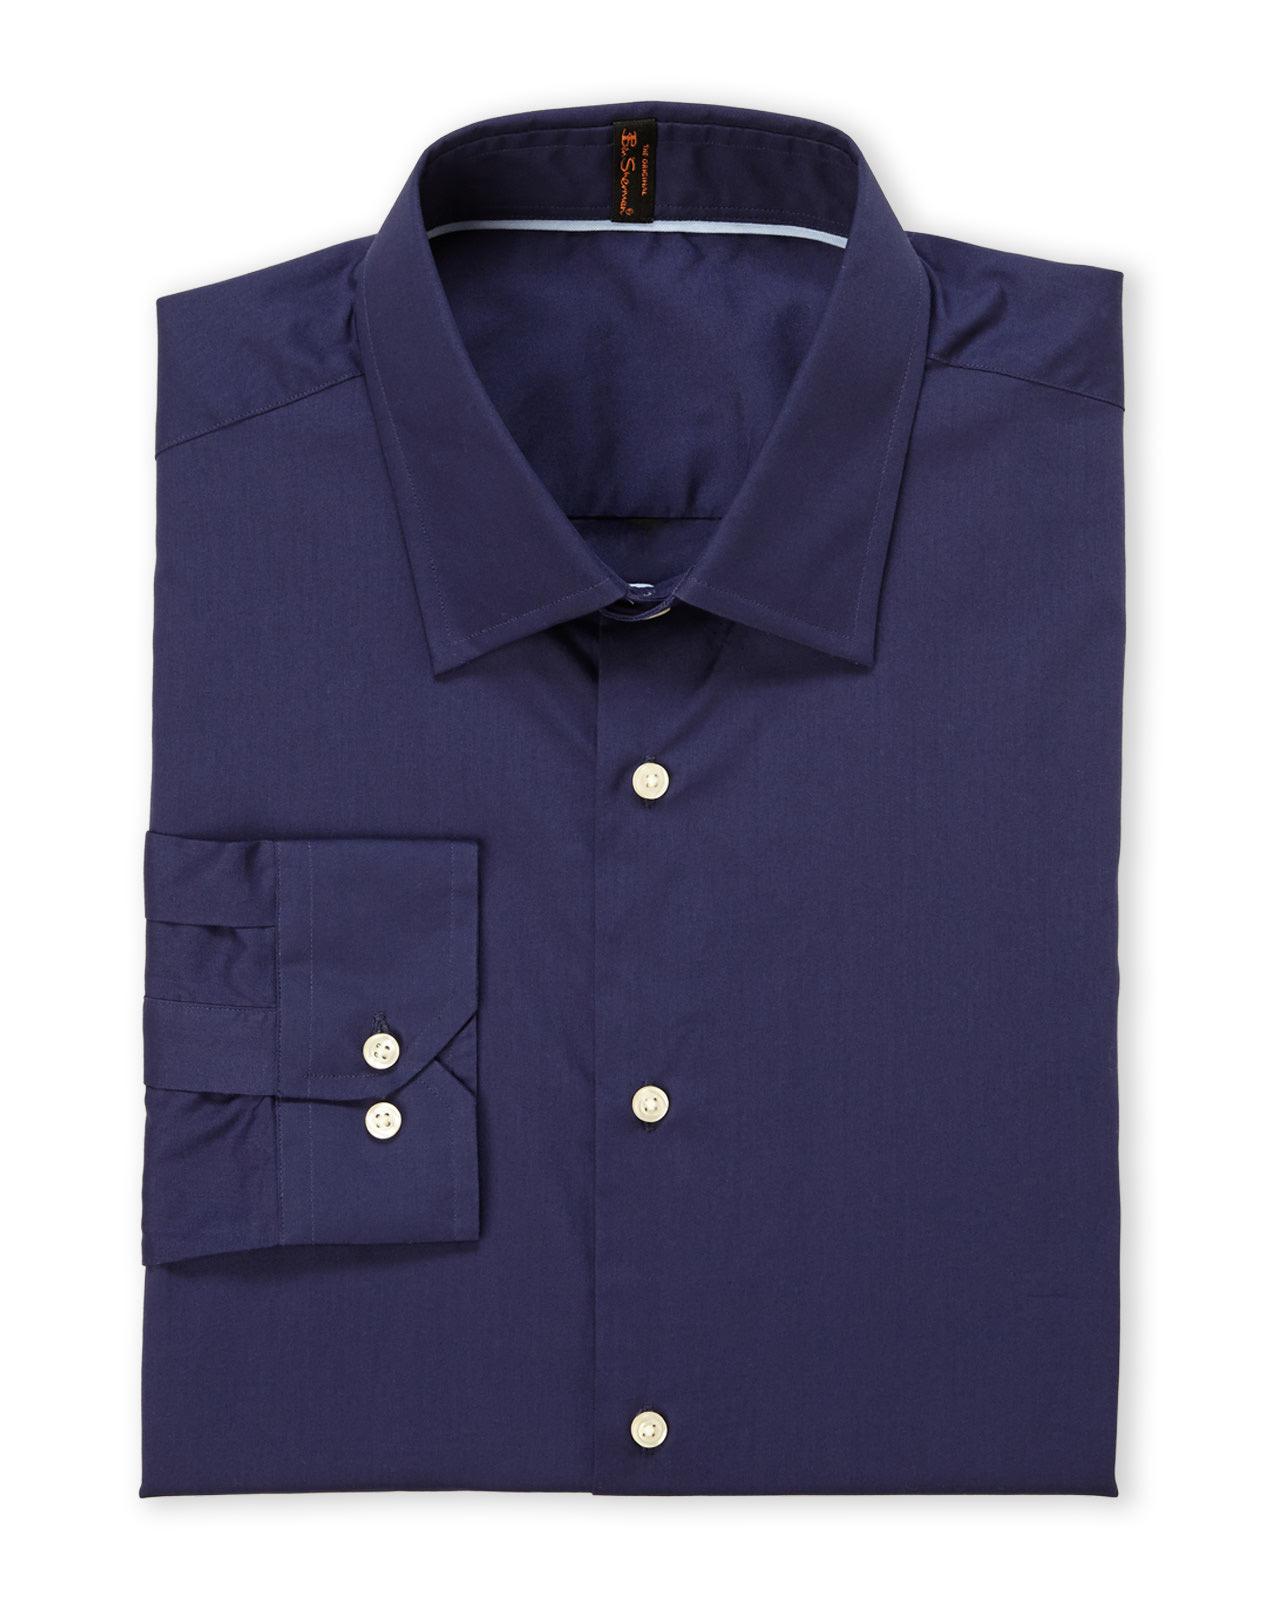 Lyst ben sherman navy camden super slim fit dress shirt for Super slim dress shirts